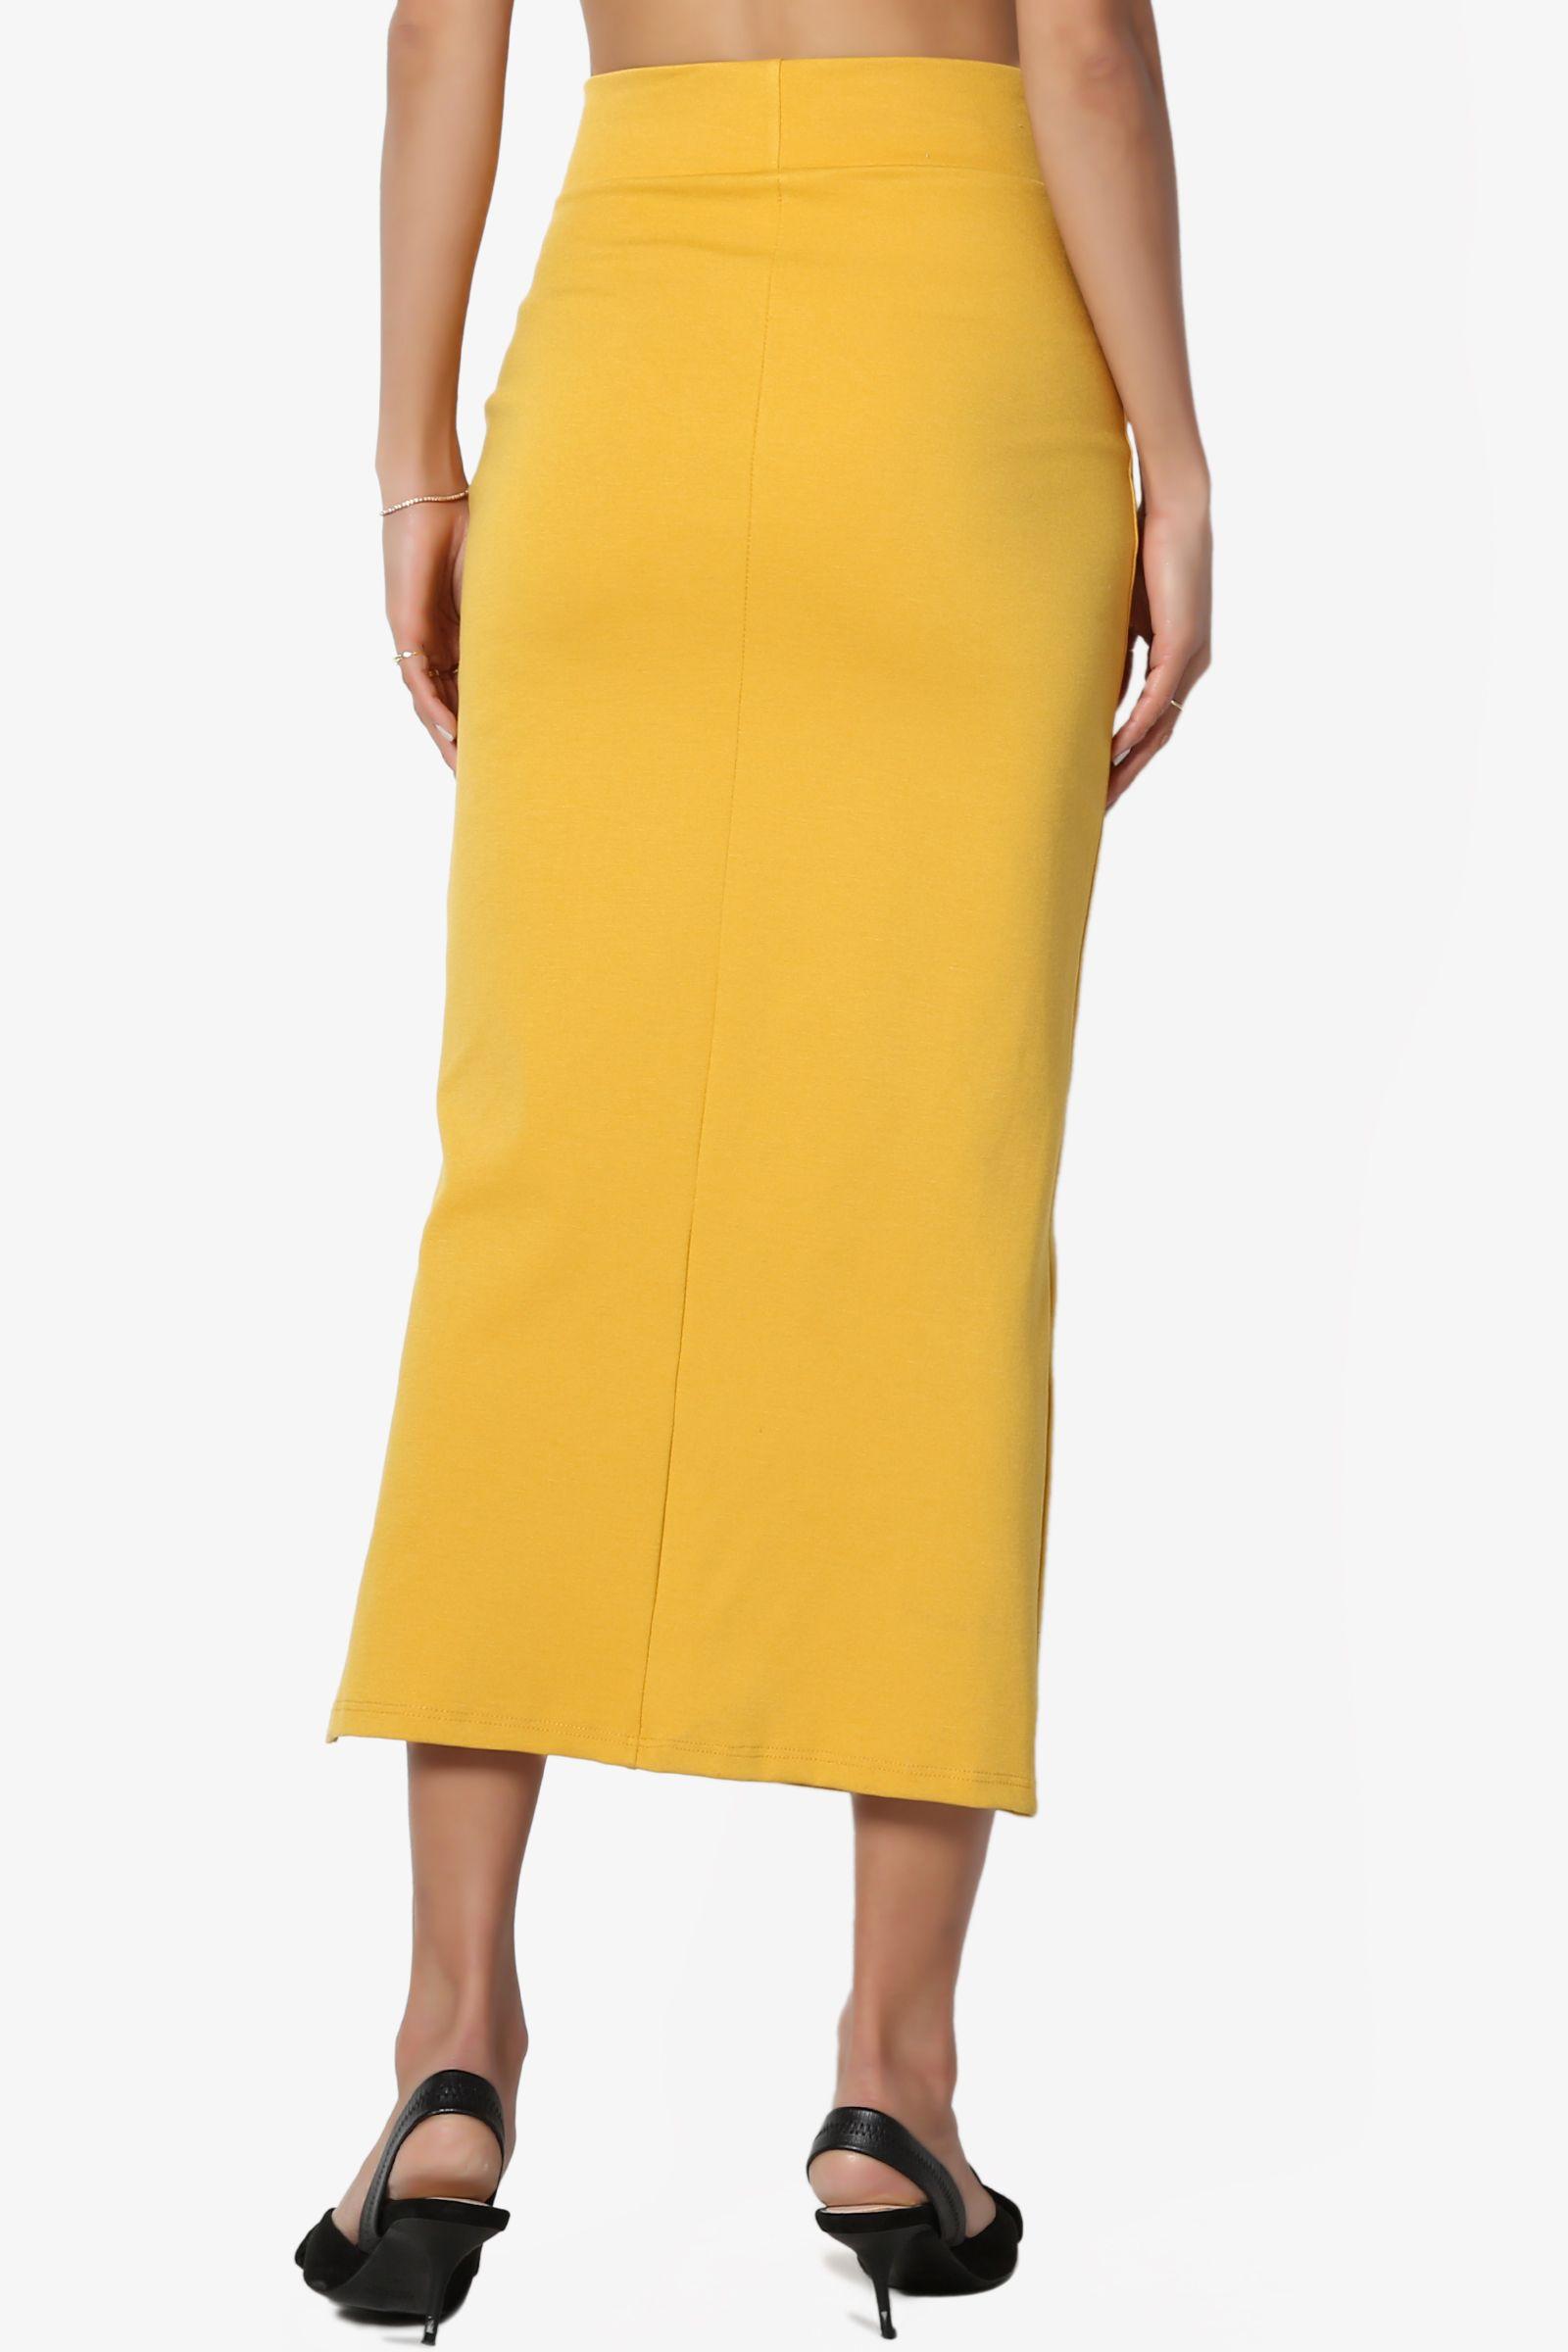 77055d1028 TheMogan Women's S~3X Side Slit Ponte Knit High Waist Mid Calf Long Pencil  Skirt #Ad #Slit, #SPONSORED, #Ponte, #Knit